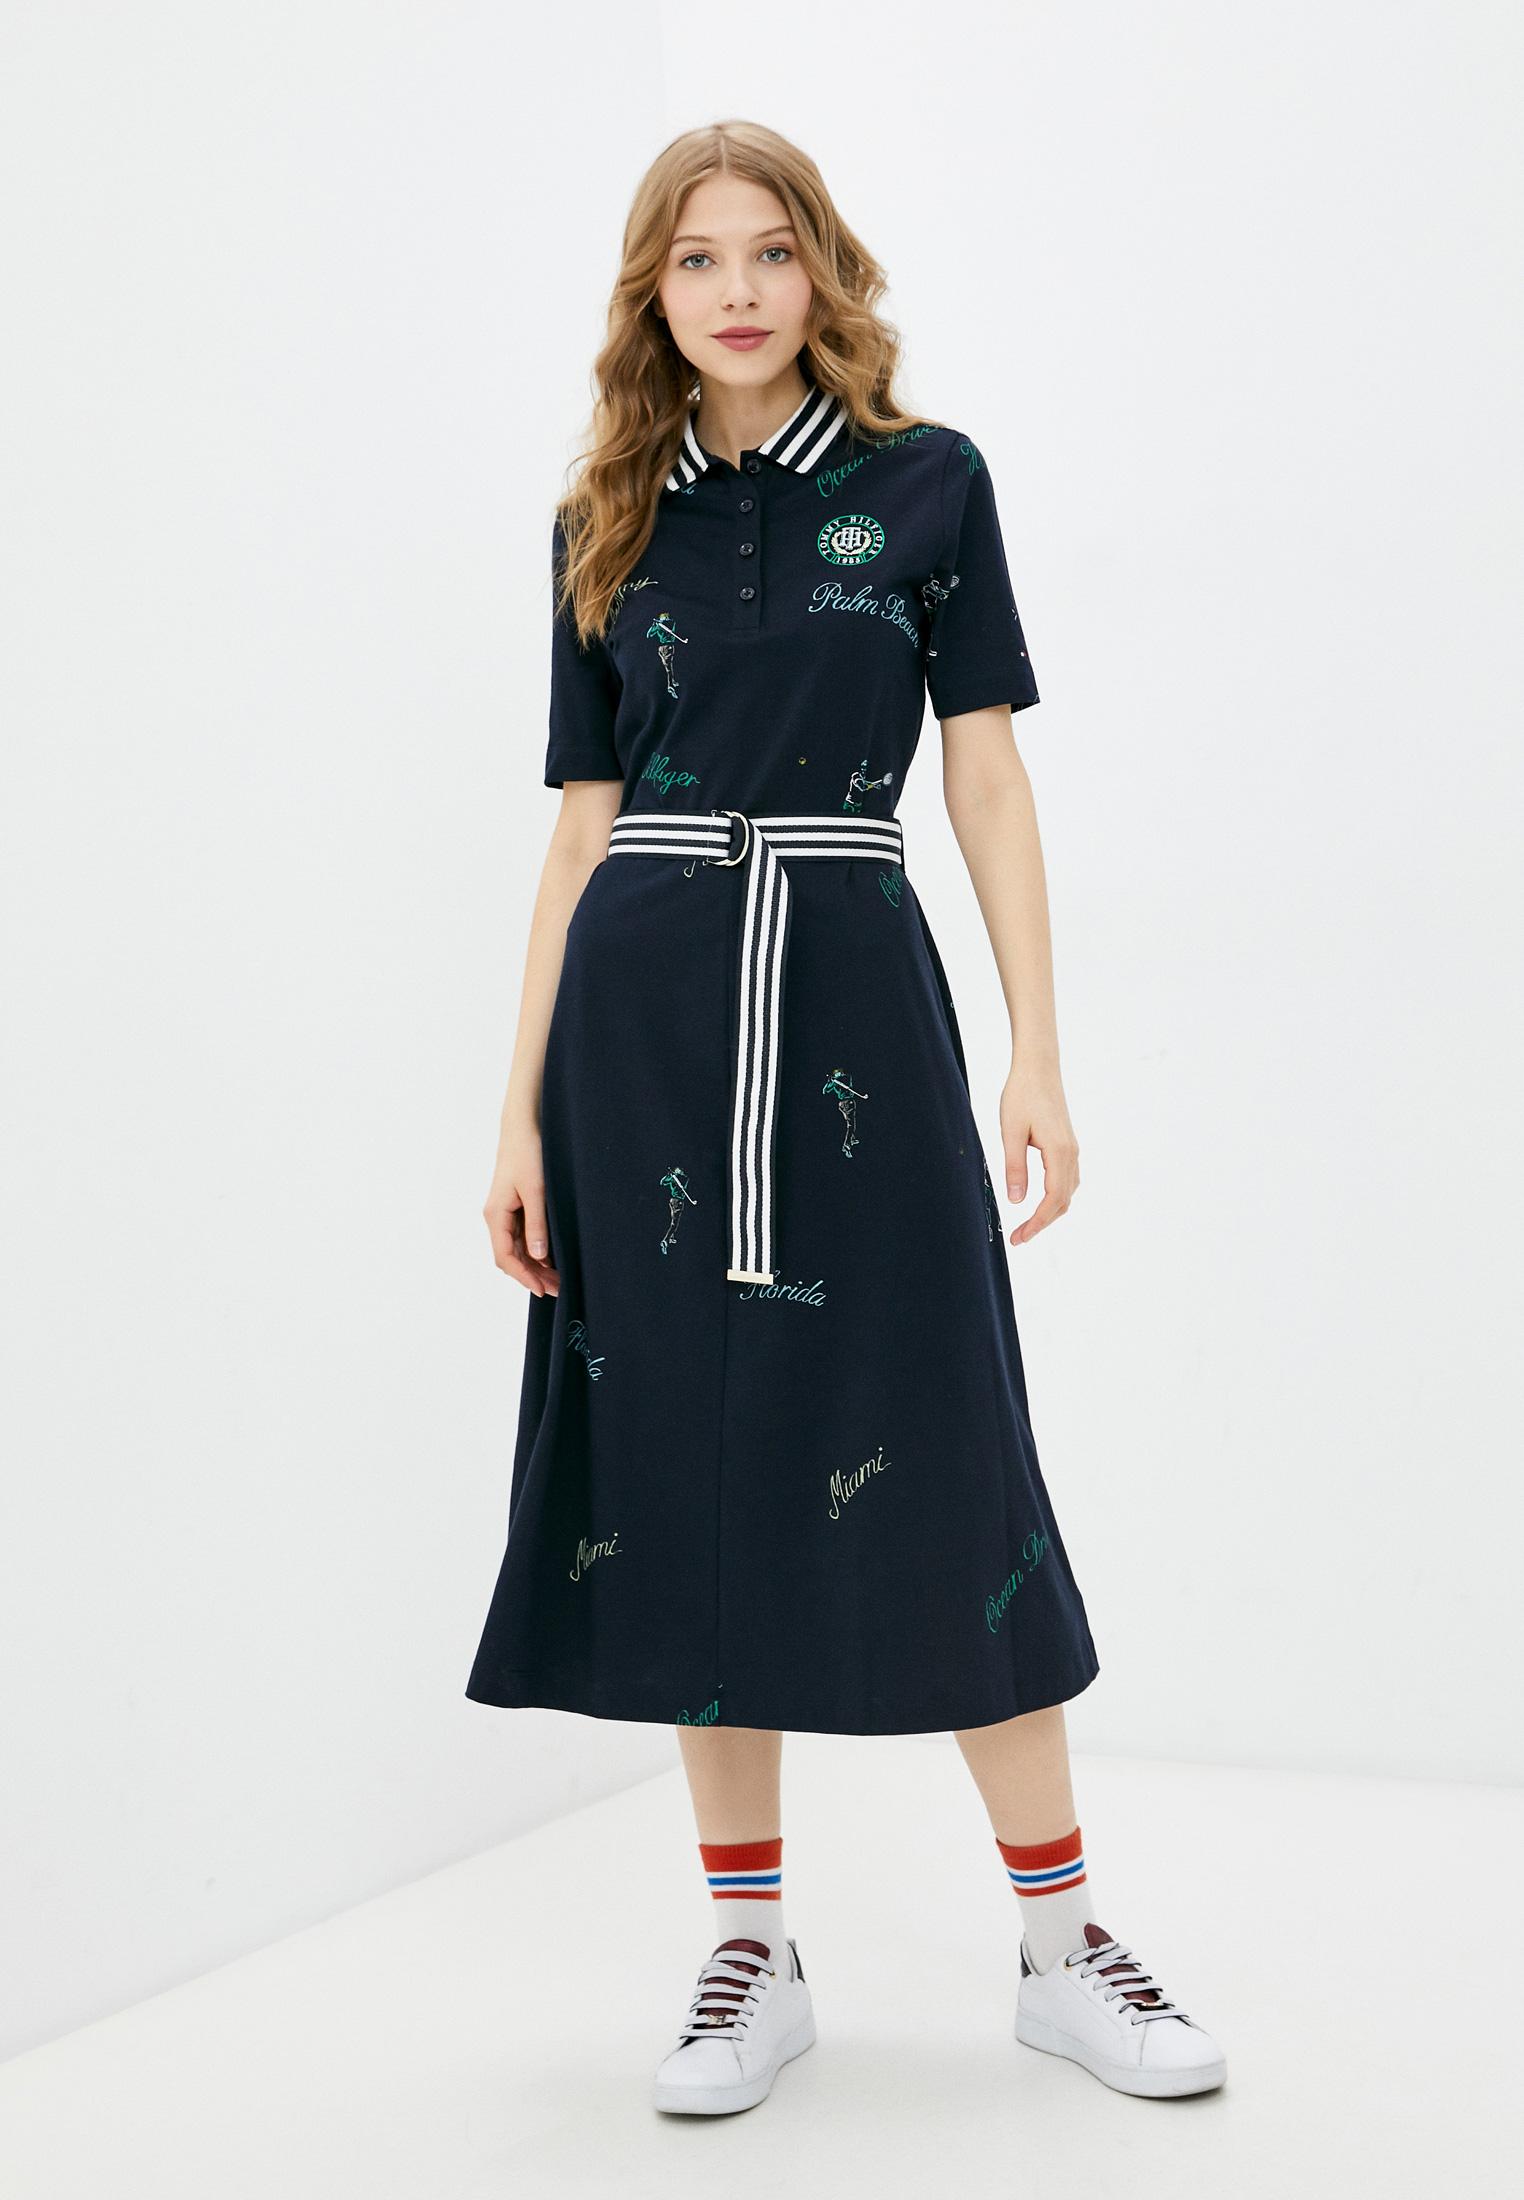 Платье Tommy Hilfiger (Томми Хилфигер) WW0WW30830: изображение 1